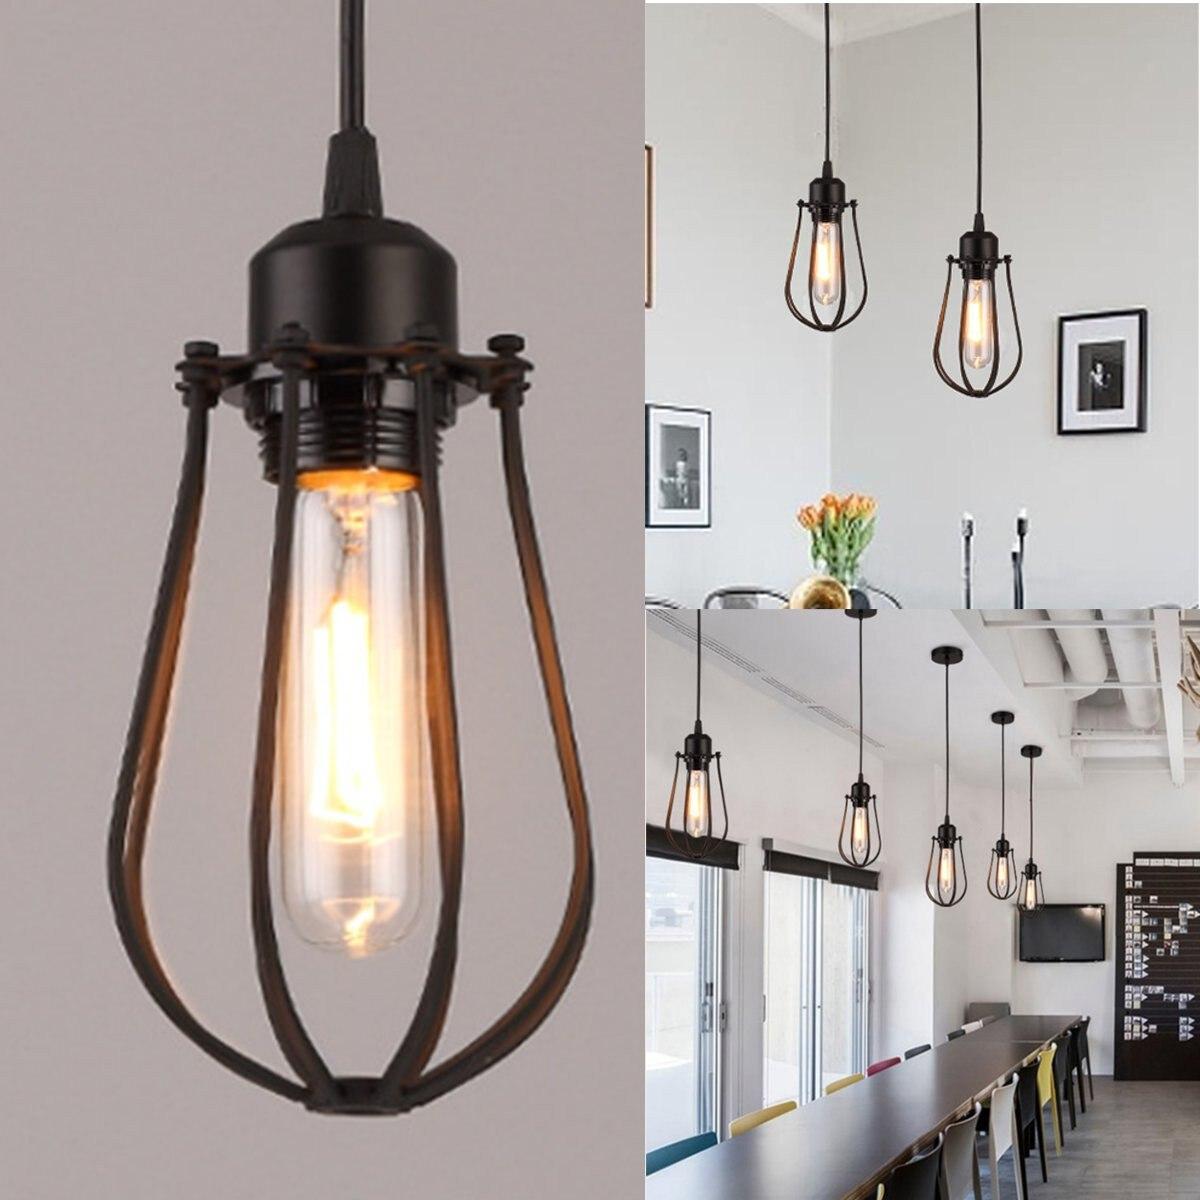 Retro Ceiling Fixtures Vintage Chandelier Industrial Pendant Light HomeDeco Lamp